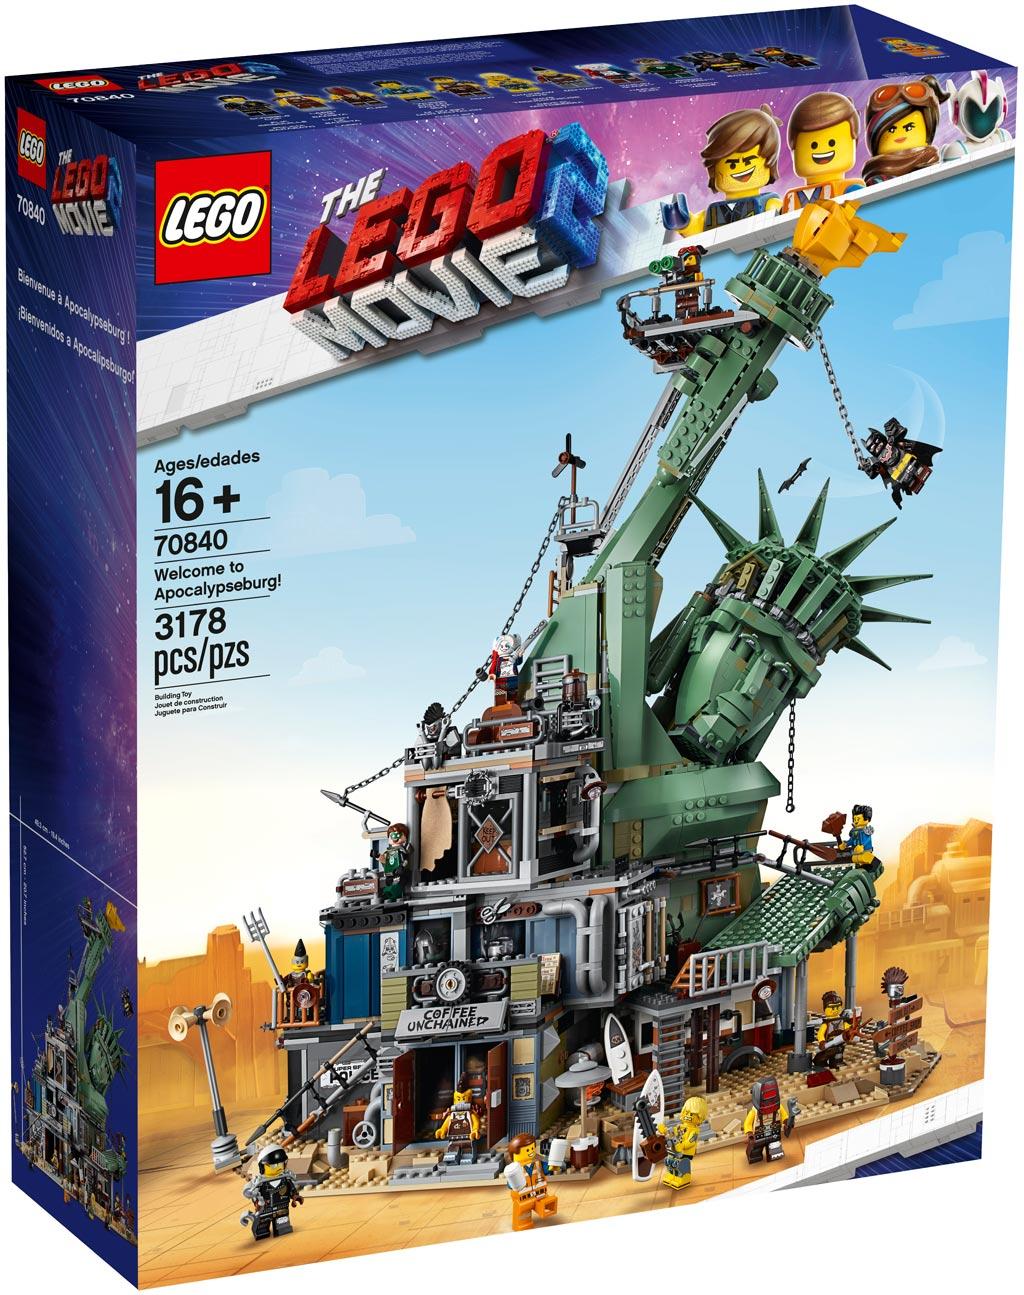 the-lego-movie-2-welcome-to-apocalypseburg-70840-box-front-2019 zusammengebaut.com